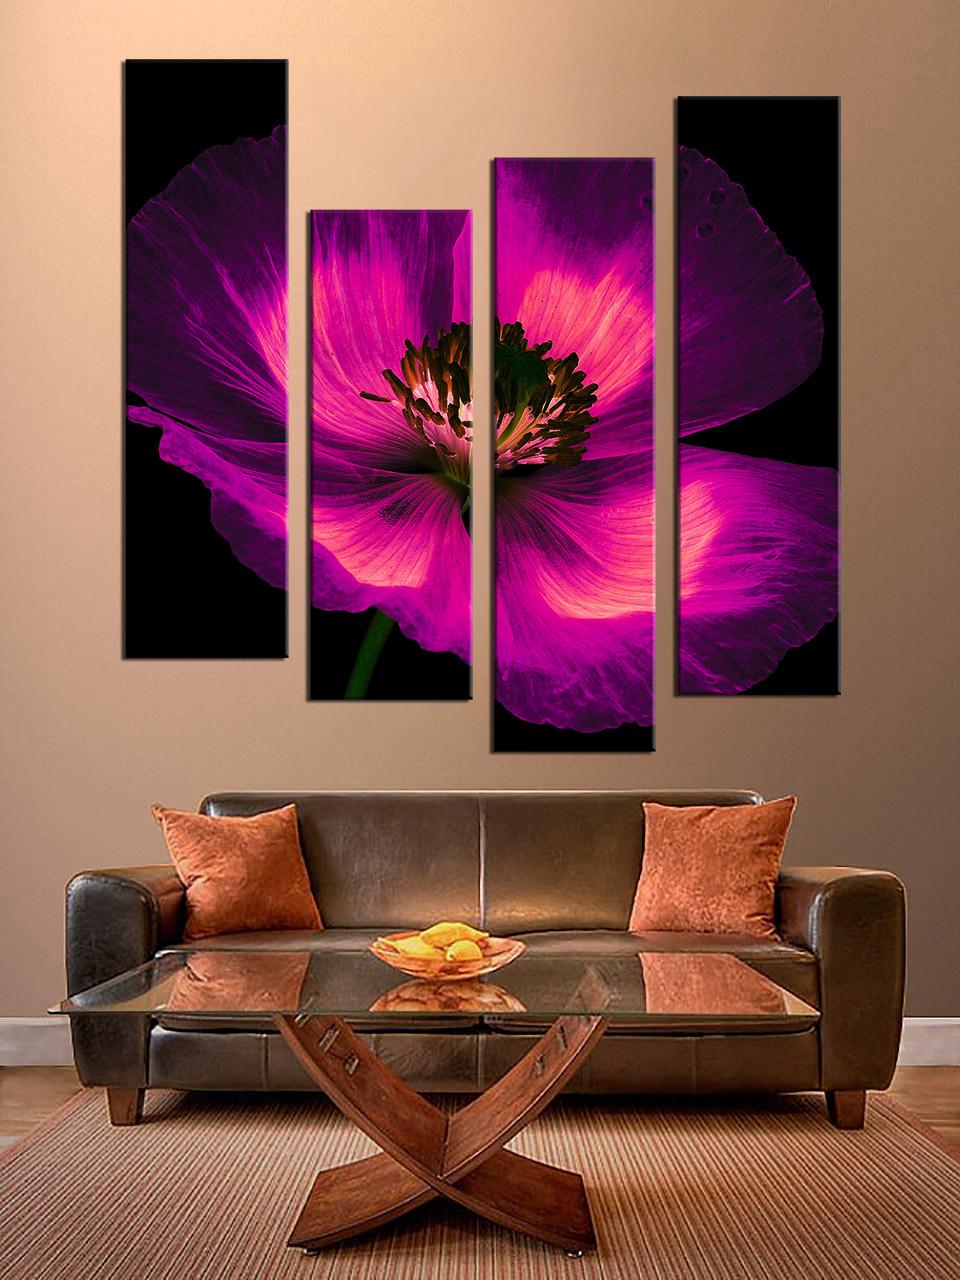 4 piece wall art purple flowers multi panel canvas floral canvas 4 piece wall art purple flowers multi panel canvas floral canvas photography panoramic artwork flowers decor floral artwork amipublicfo Image collections